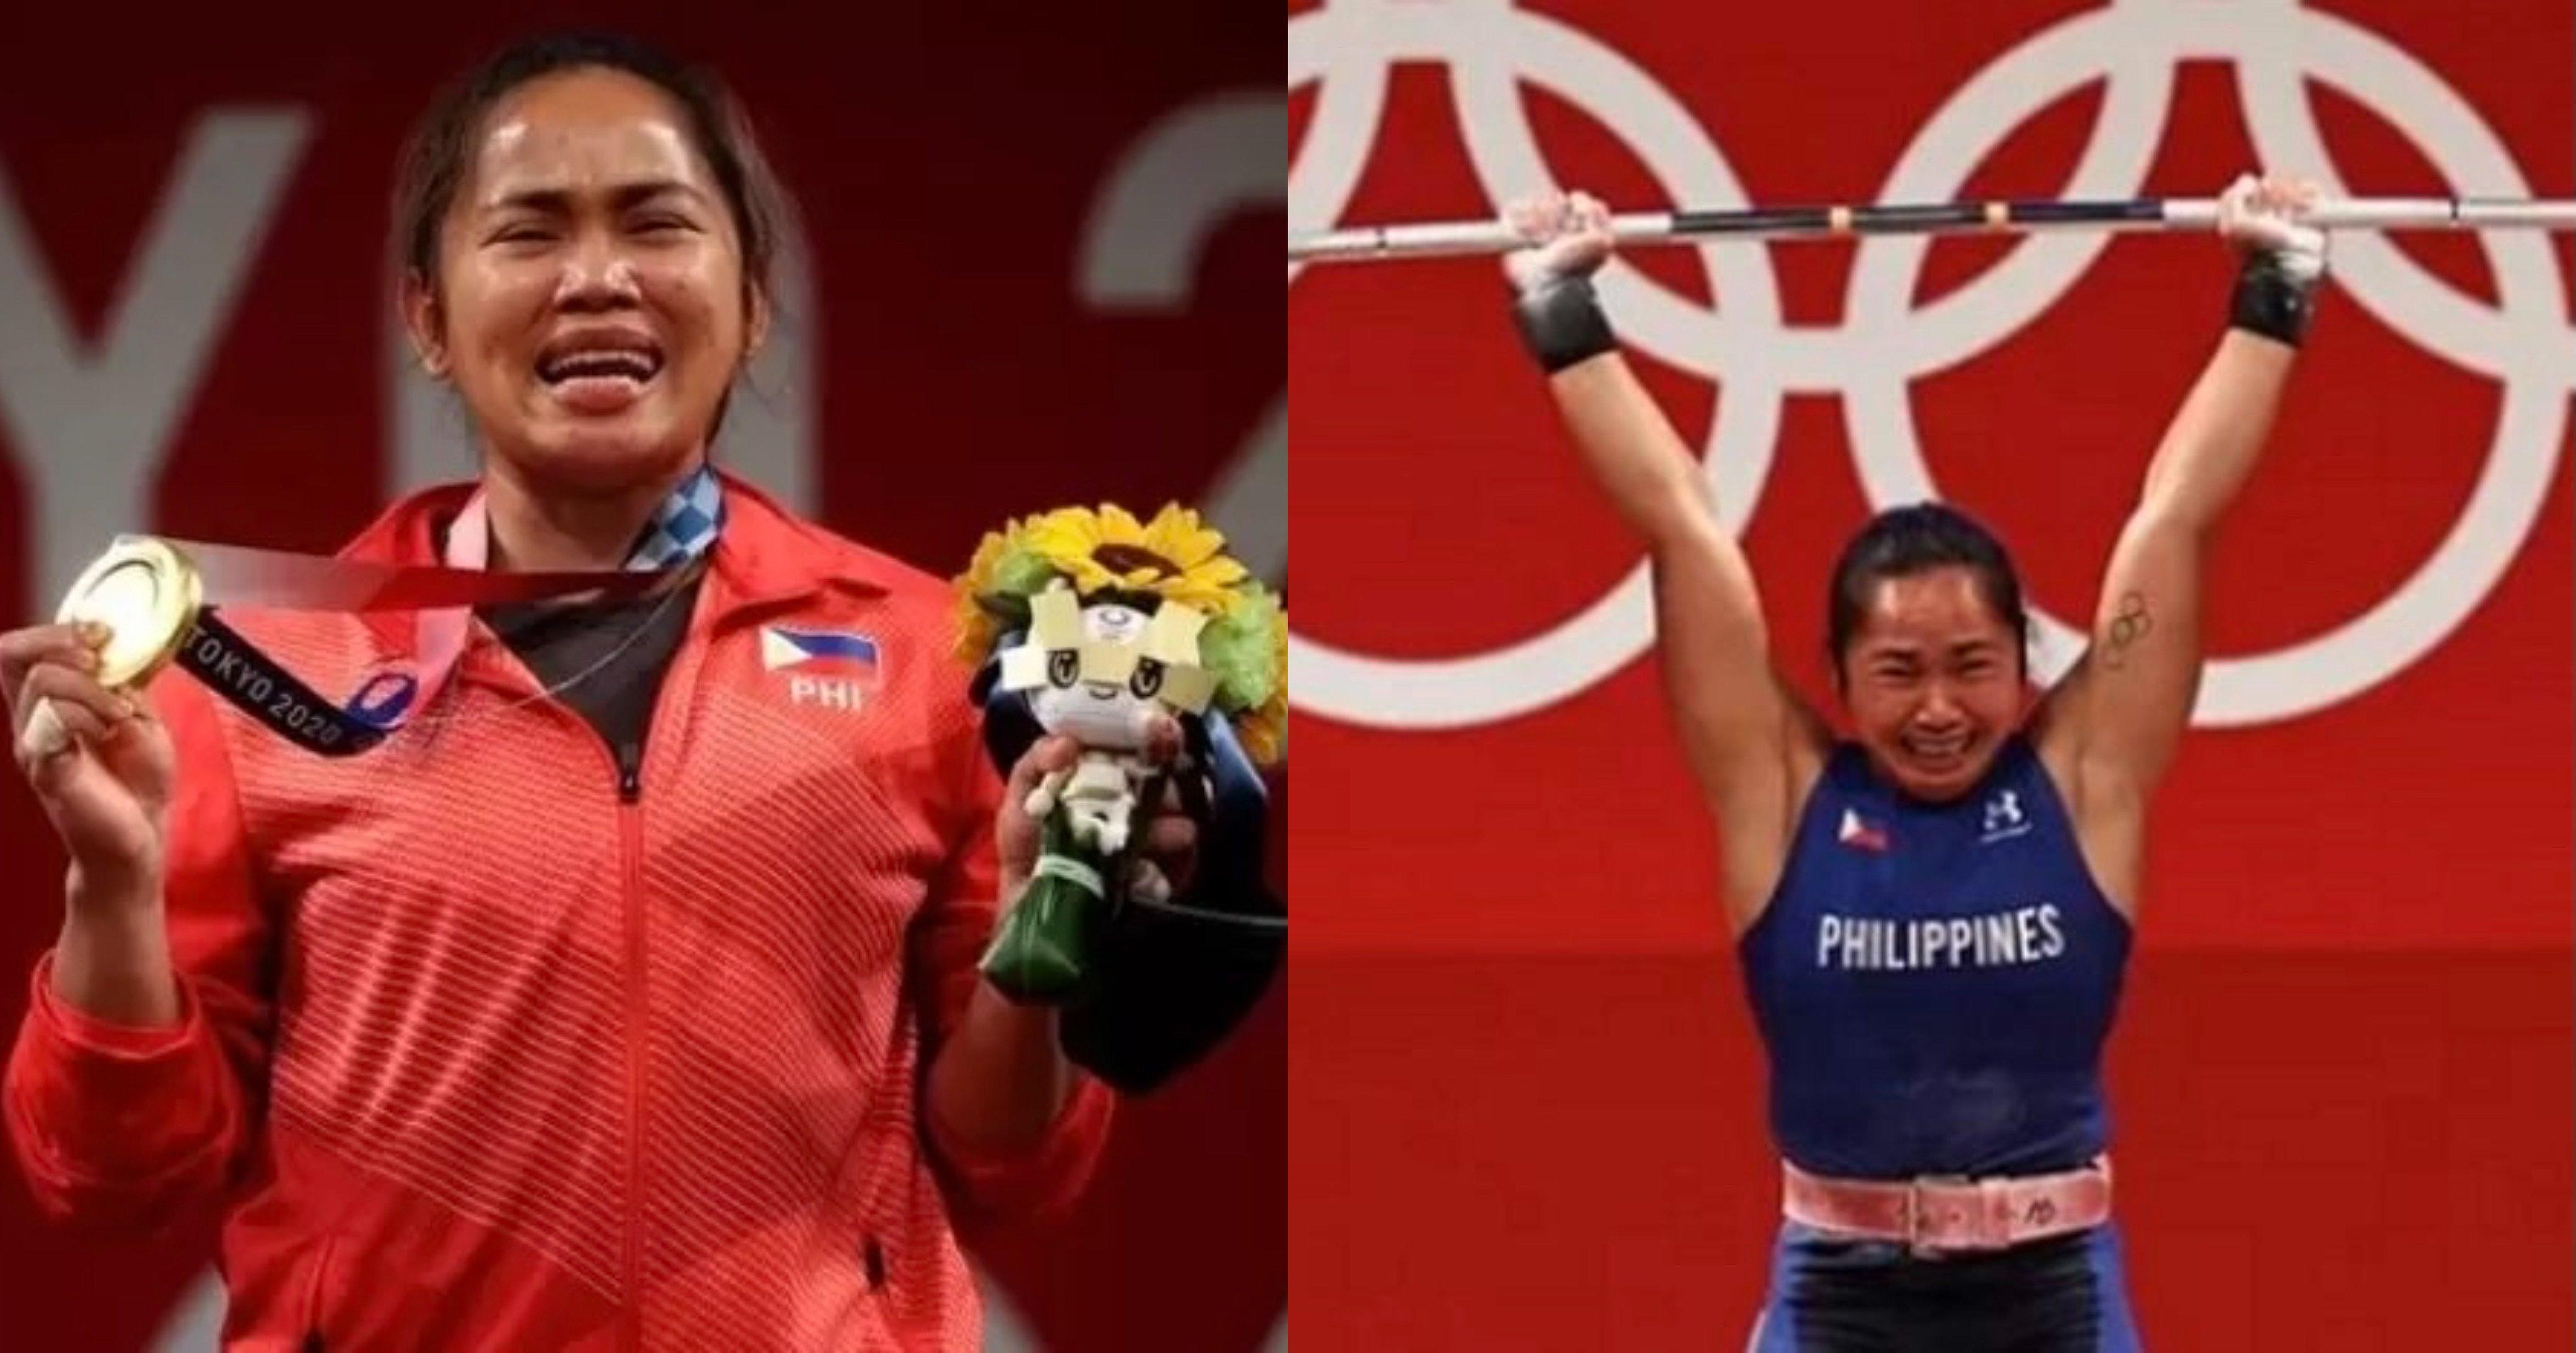 f5b476ed 29c4 4589 8c95 aefb0bd4aa74.jpeg?resize=1200,630 - 사상 최초로 올림픽에서 첫 금메달 딴 필리핀 선수가 나라에서 받게 된다는 '선물+거액 포상금' 수준